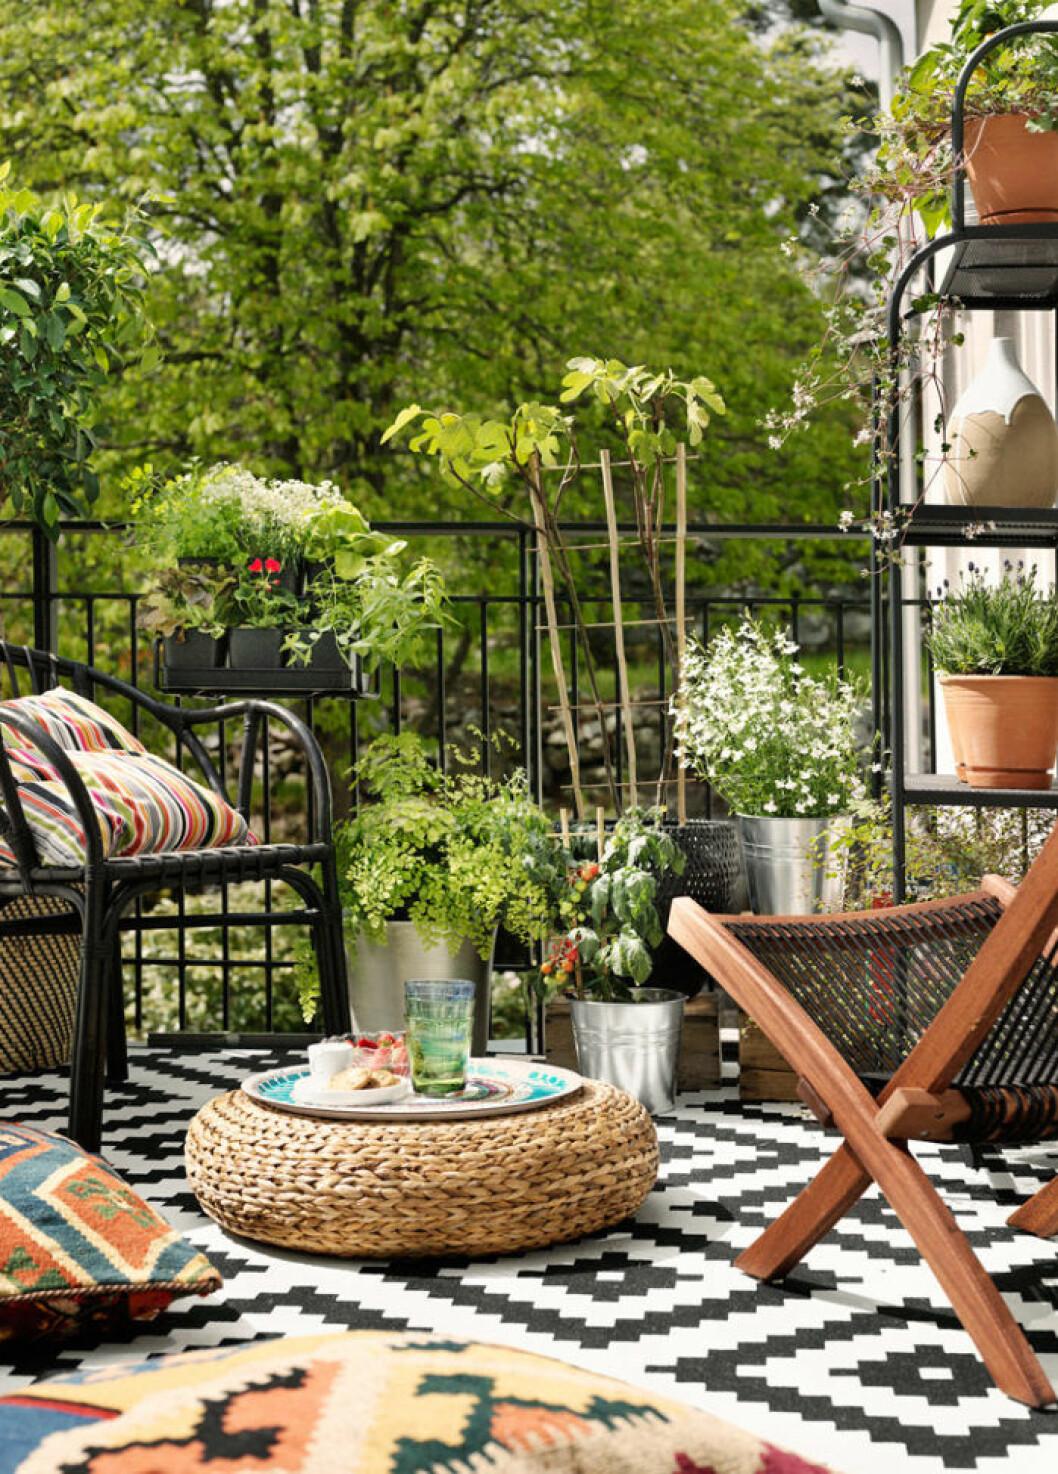 Summer balcony inspiration.